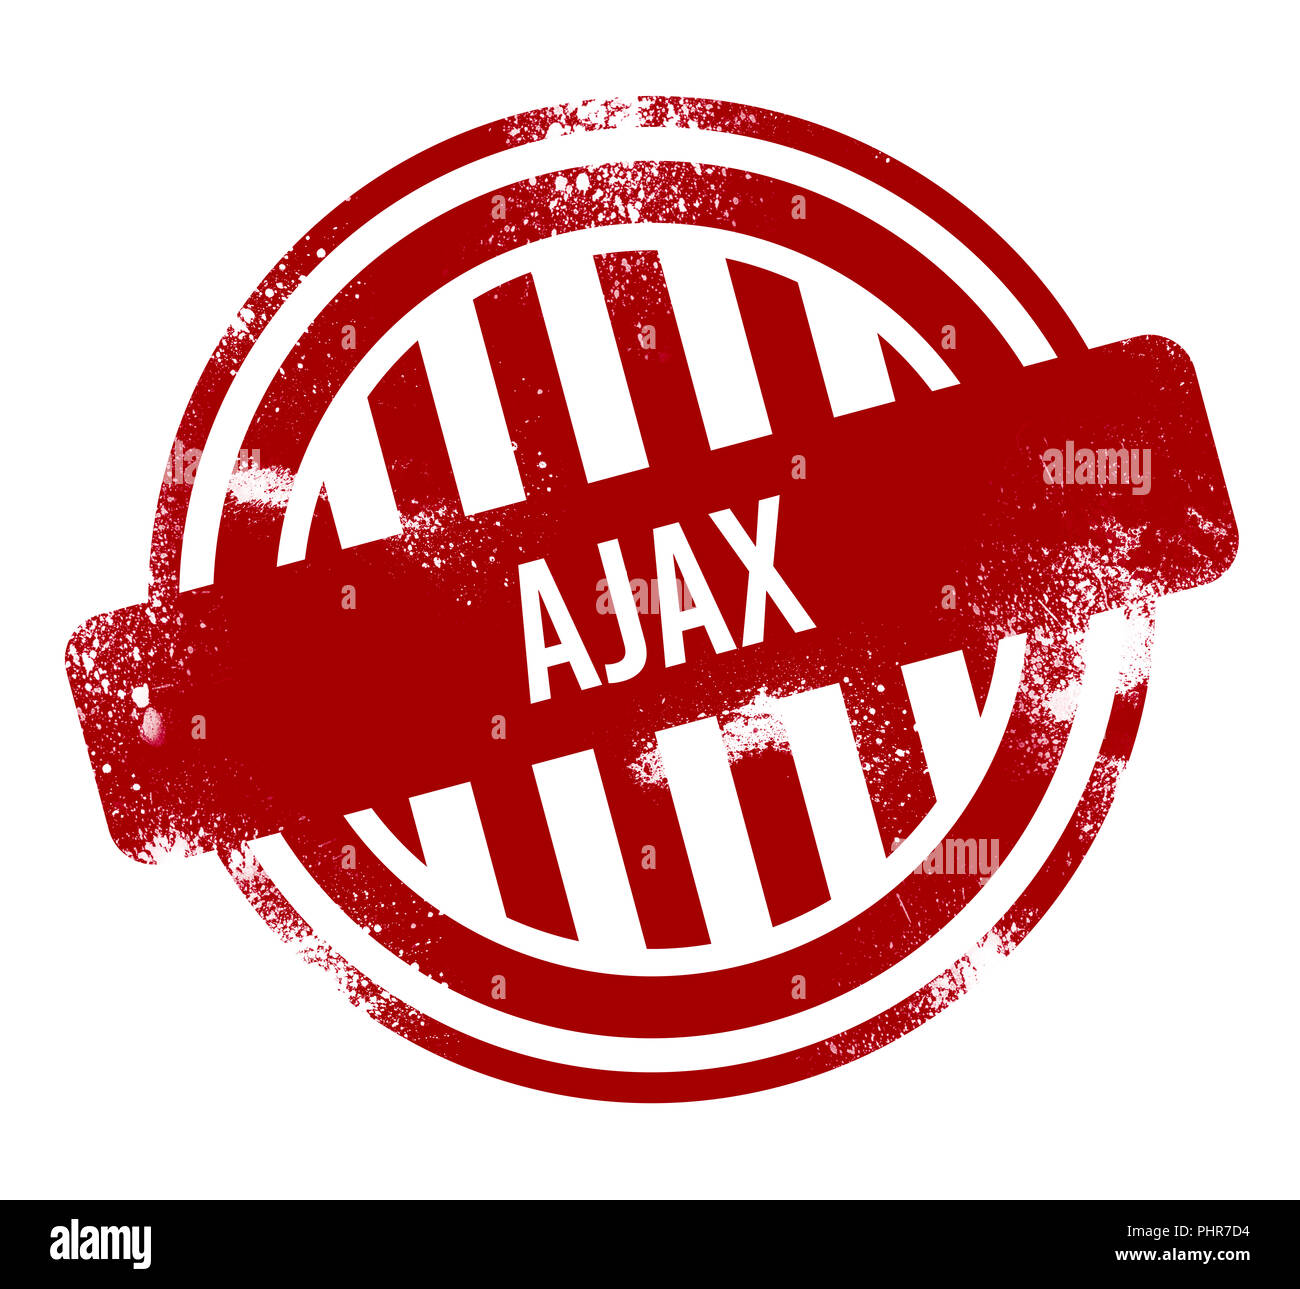 Ajax - red grunge button, stamp - Stock Image